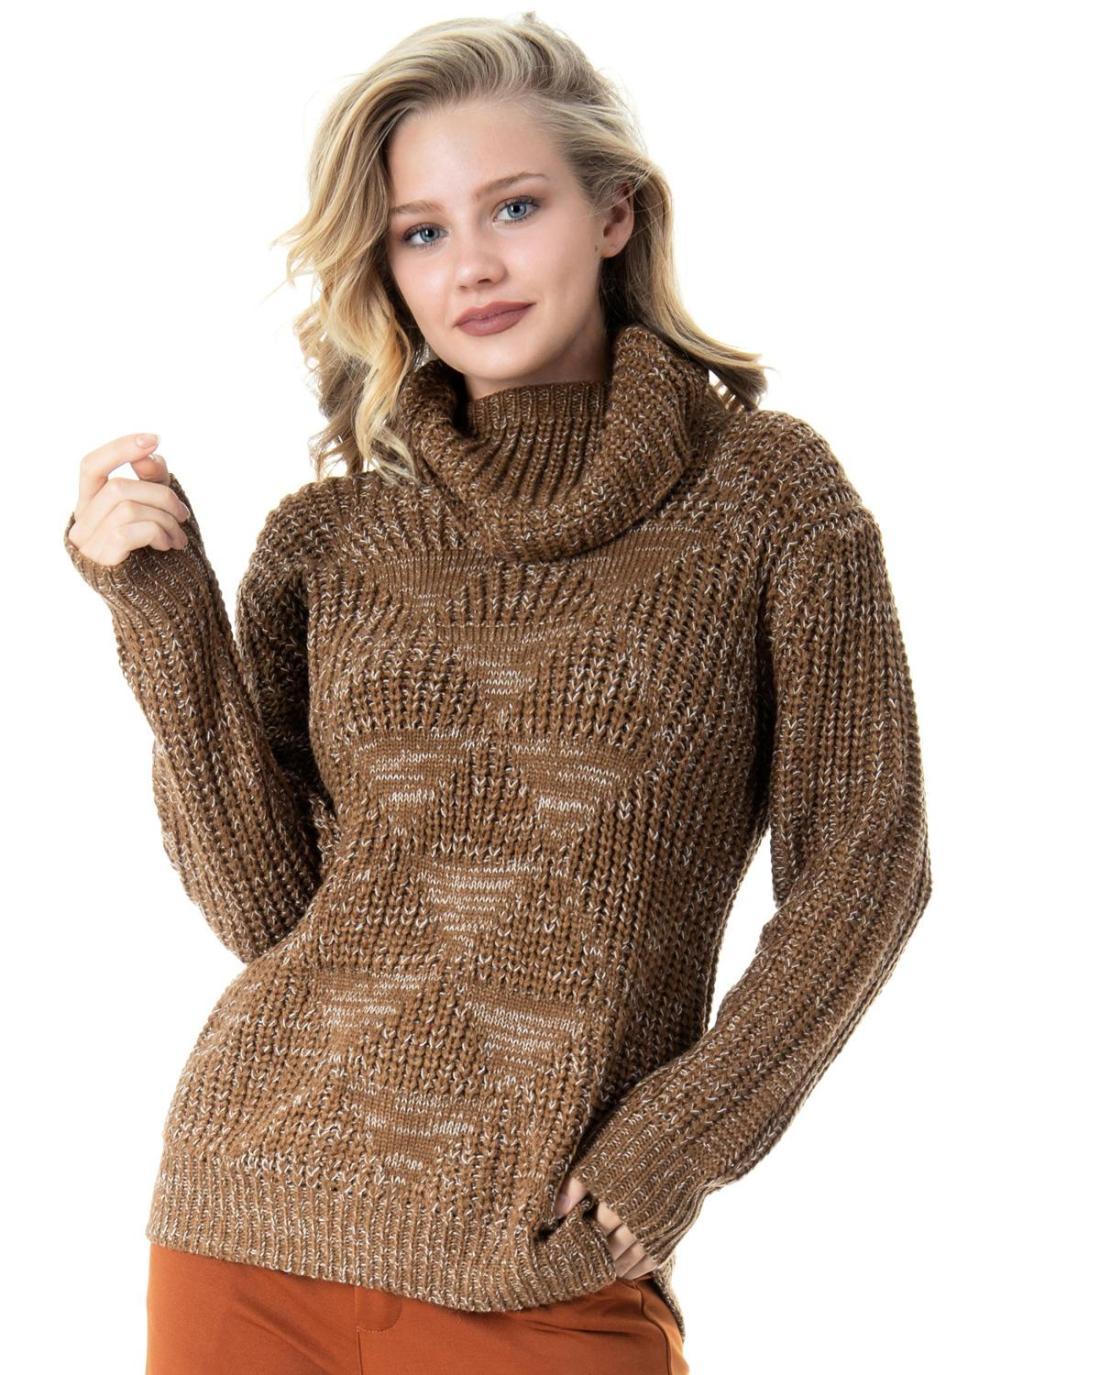 Brauner Pullover